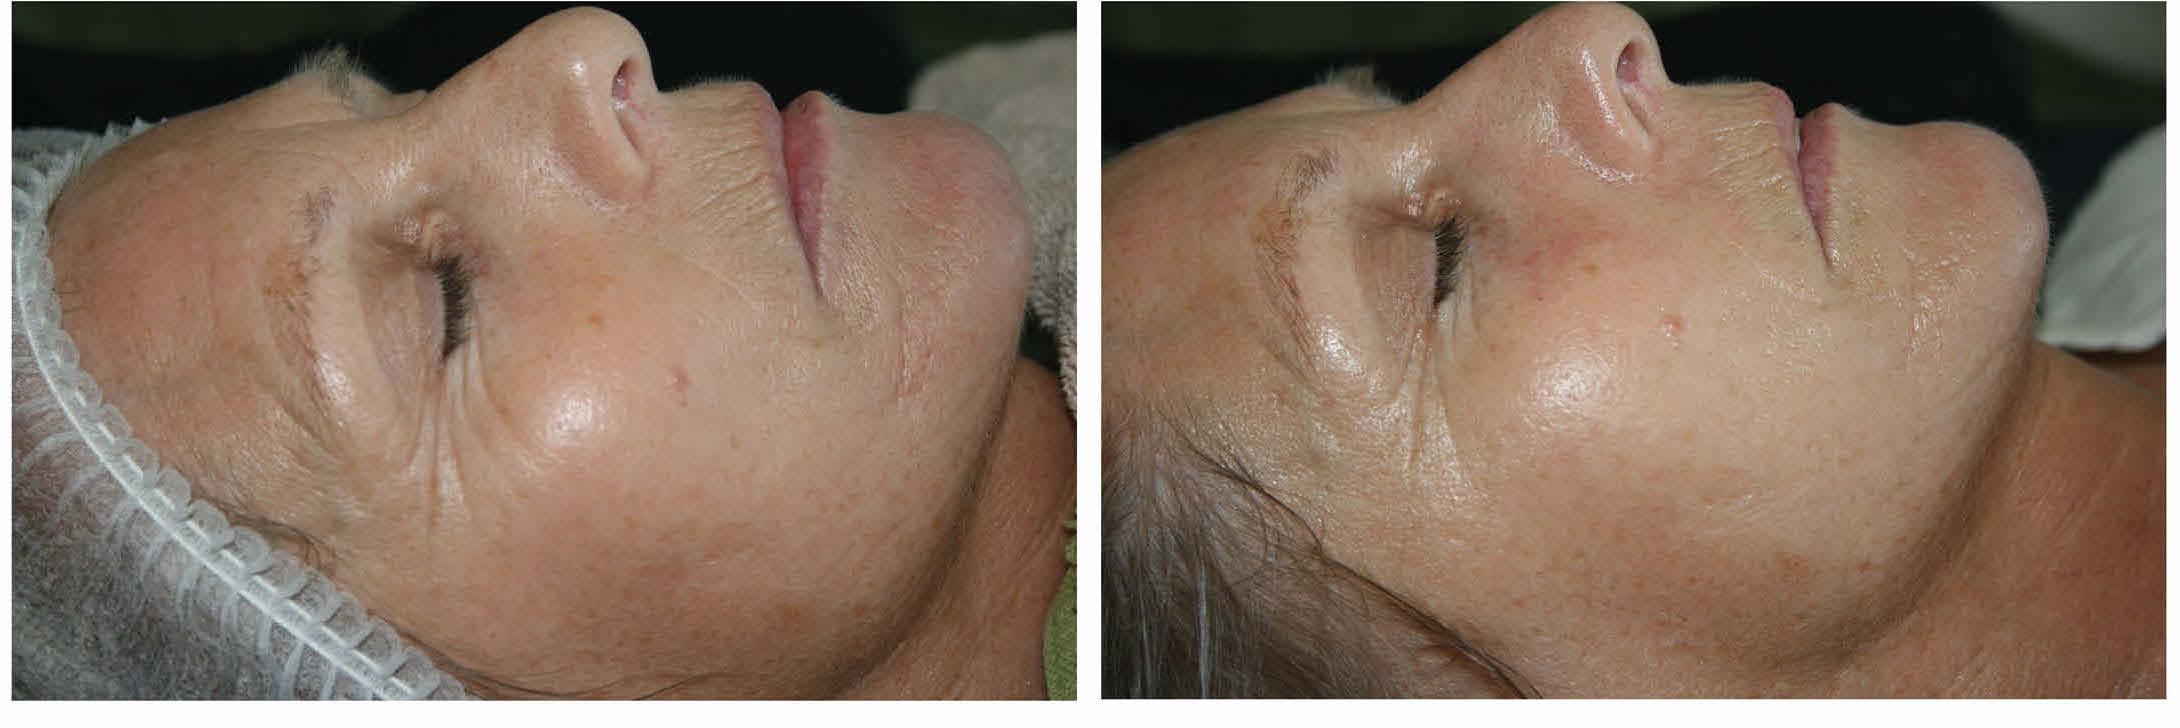 Qi beauty Treatment results.jpg